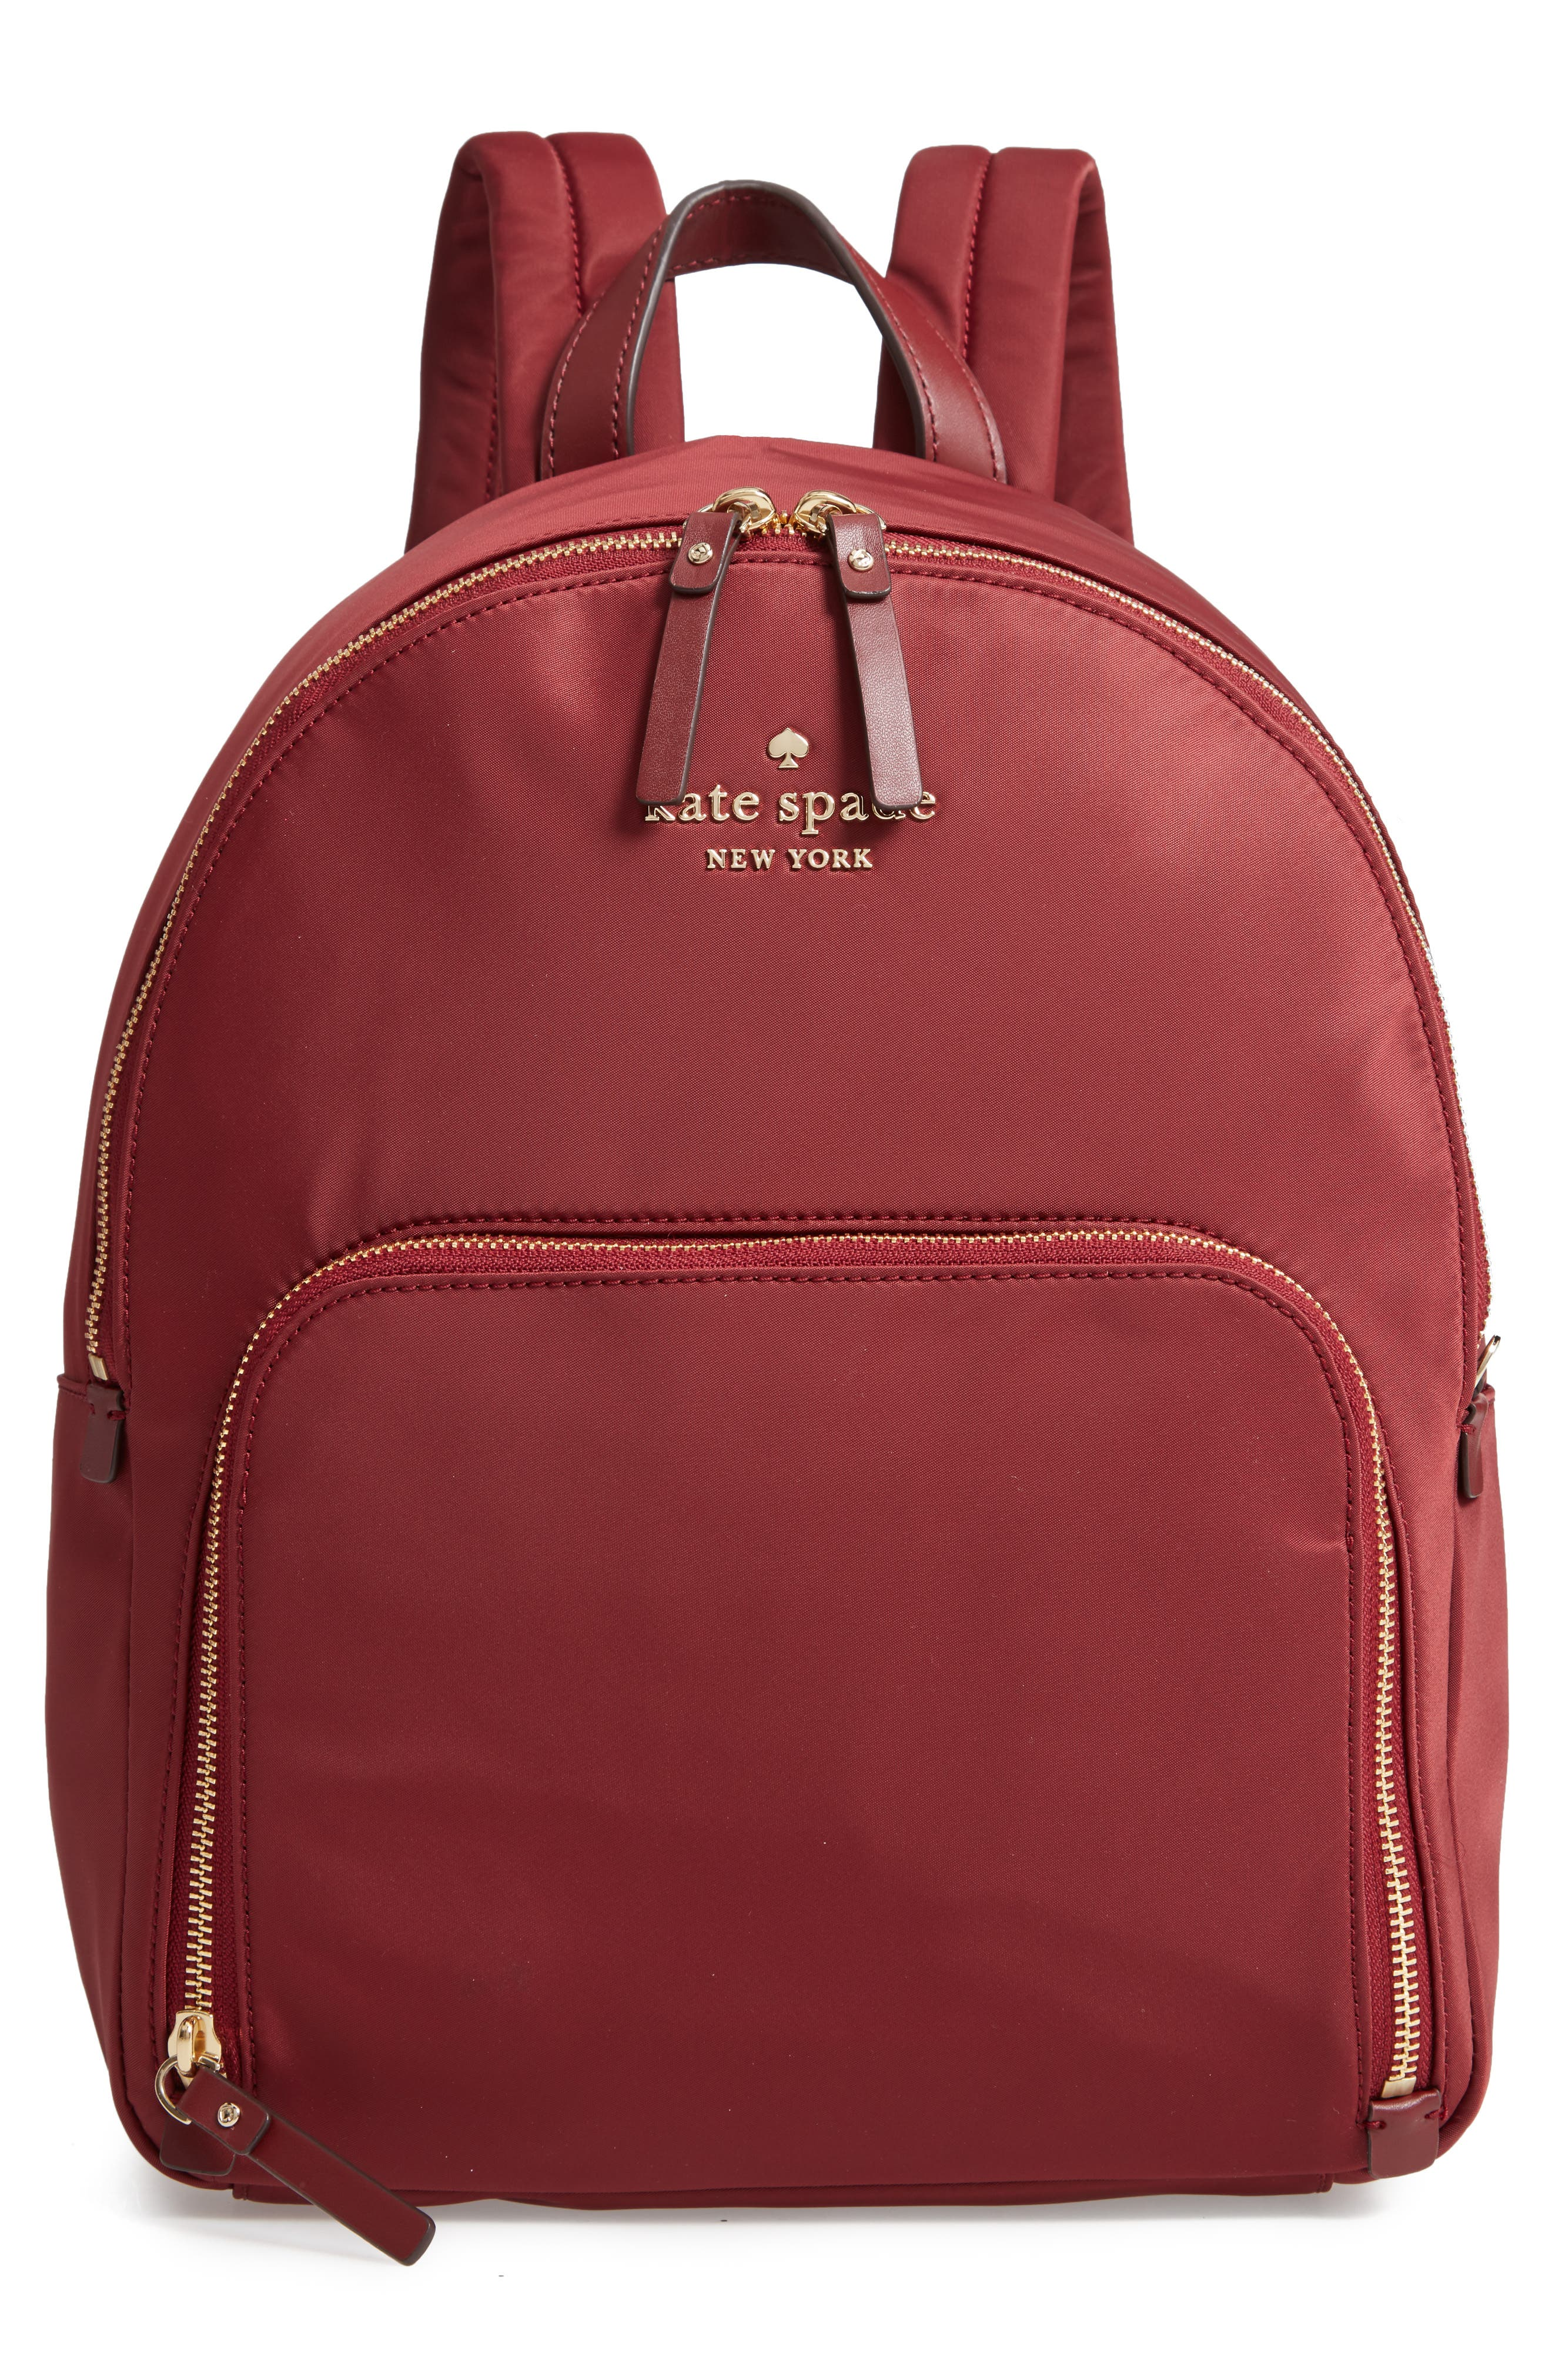 watson lane - hartley nylon backpack,                         Main,                         color, DARK CURRANT